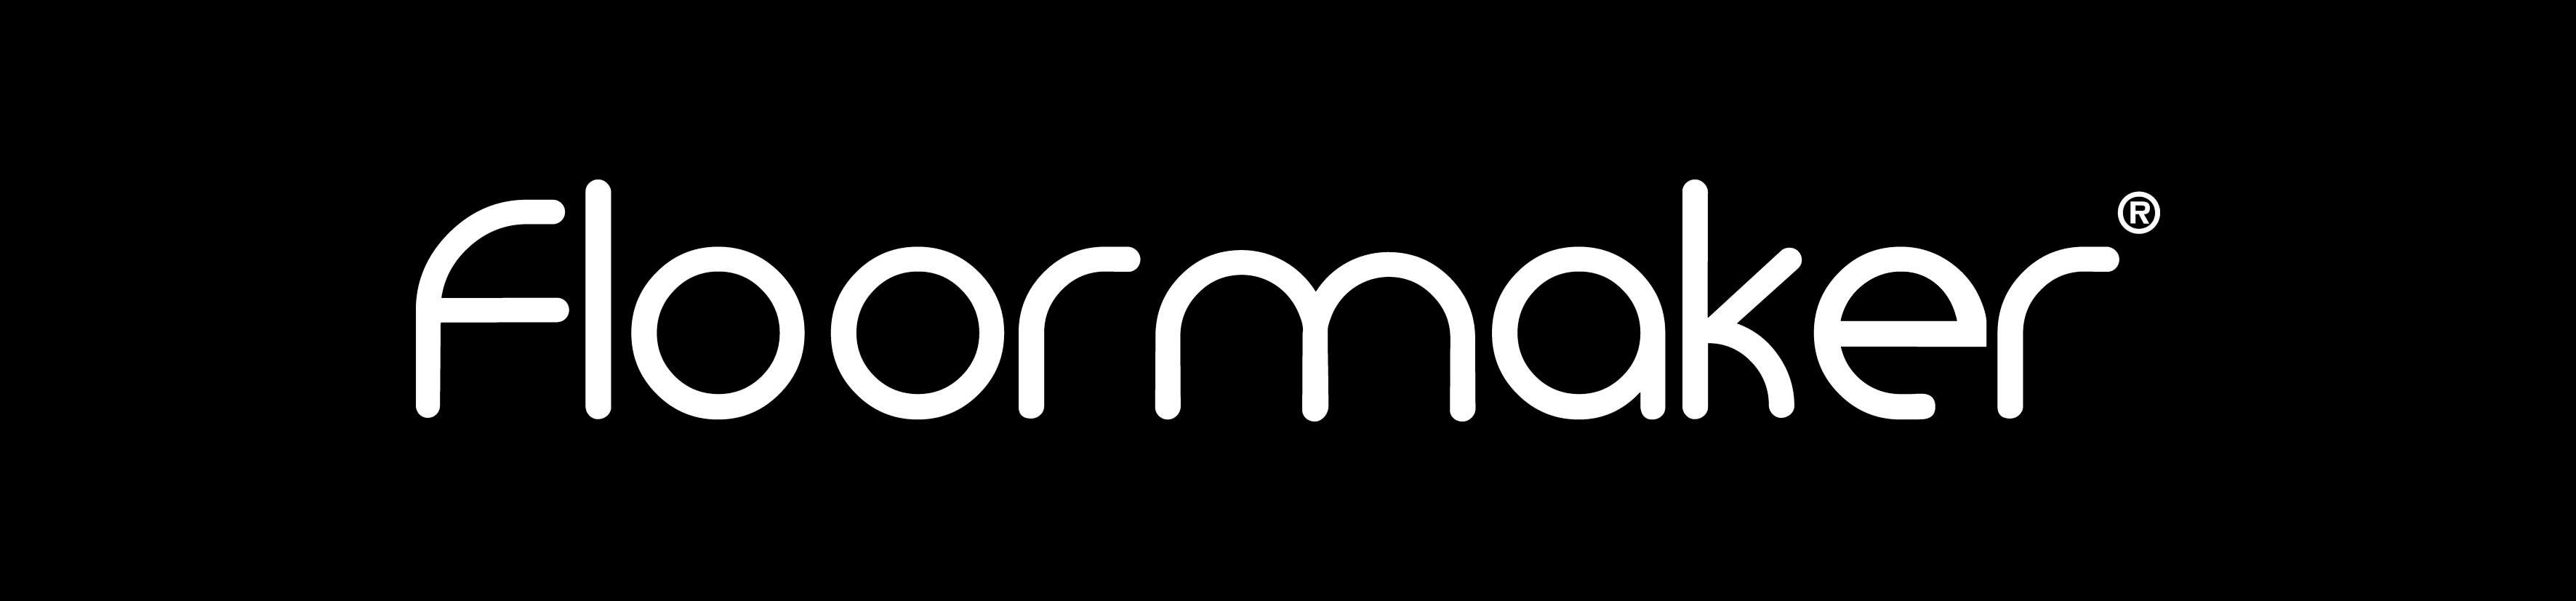 floormaker logo hires BK